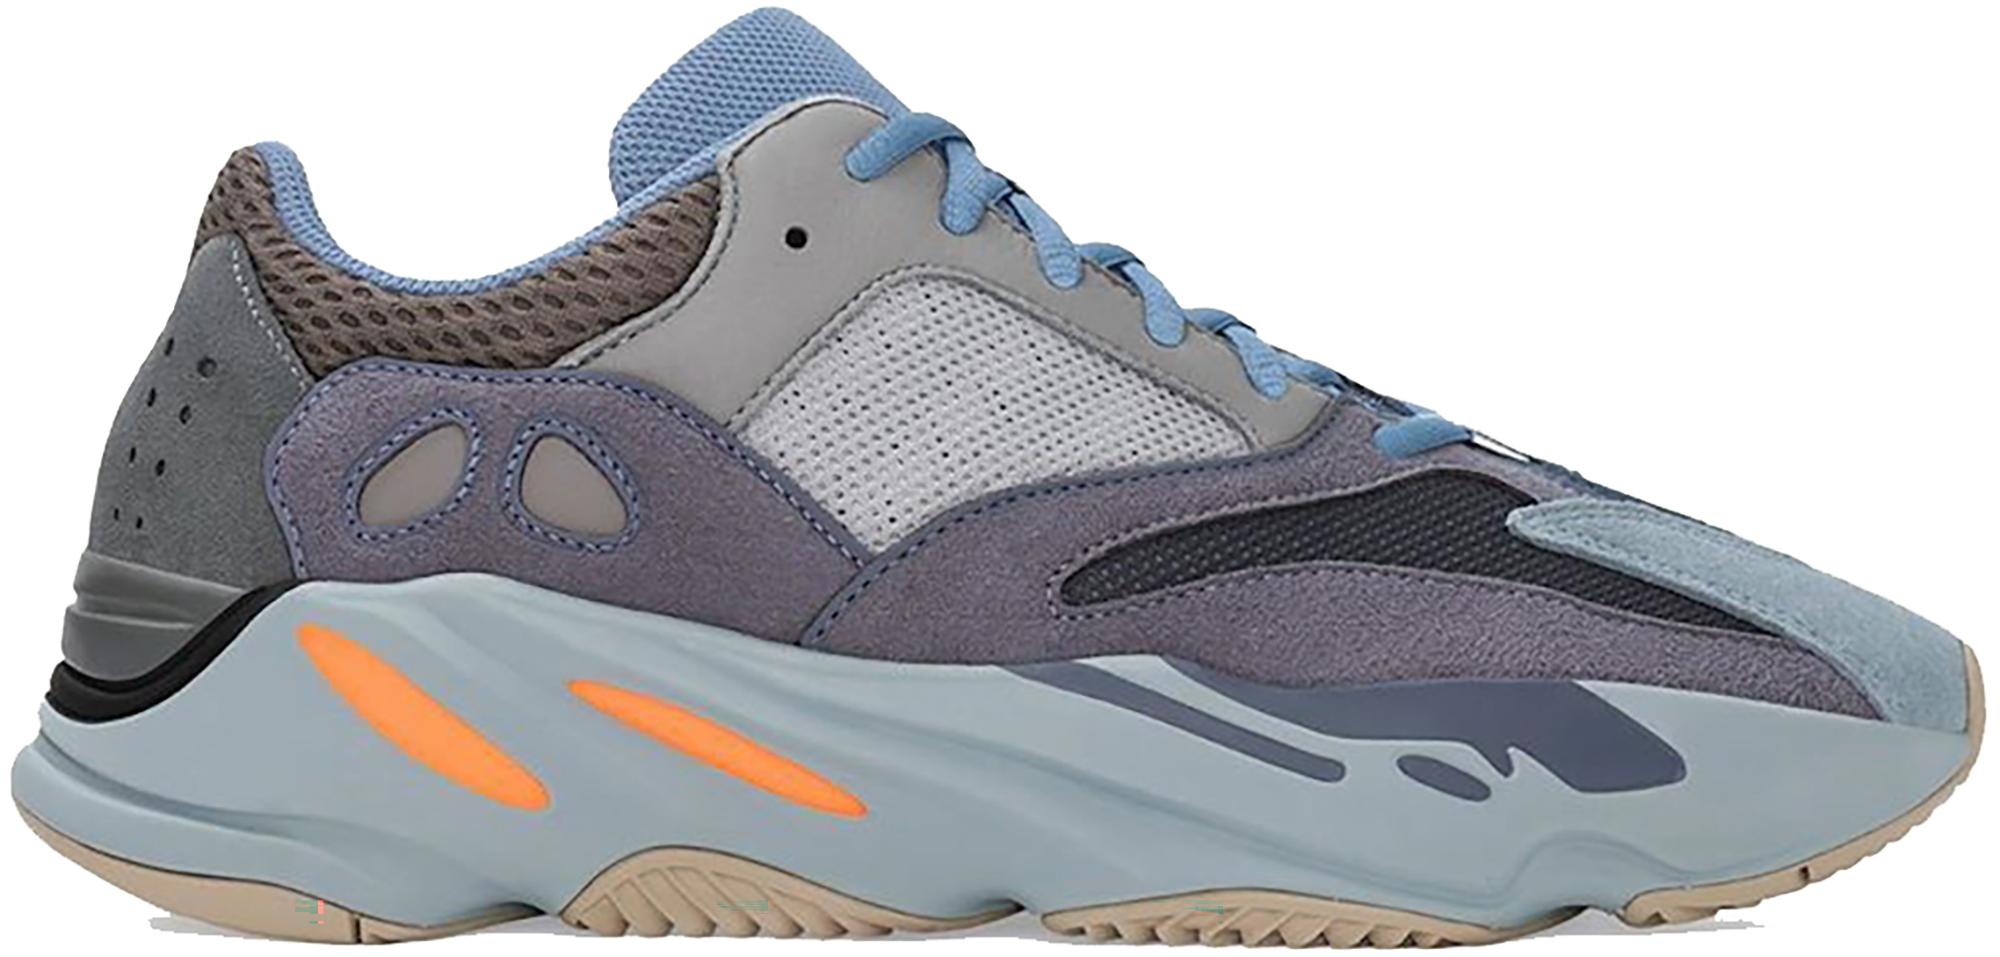 adidas Yeezy Boost 700 Carbon Blue - FW2498